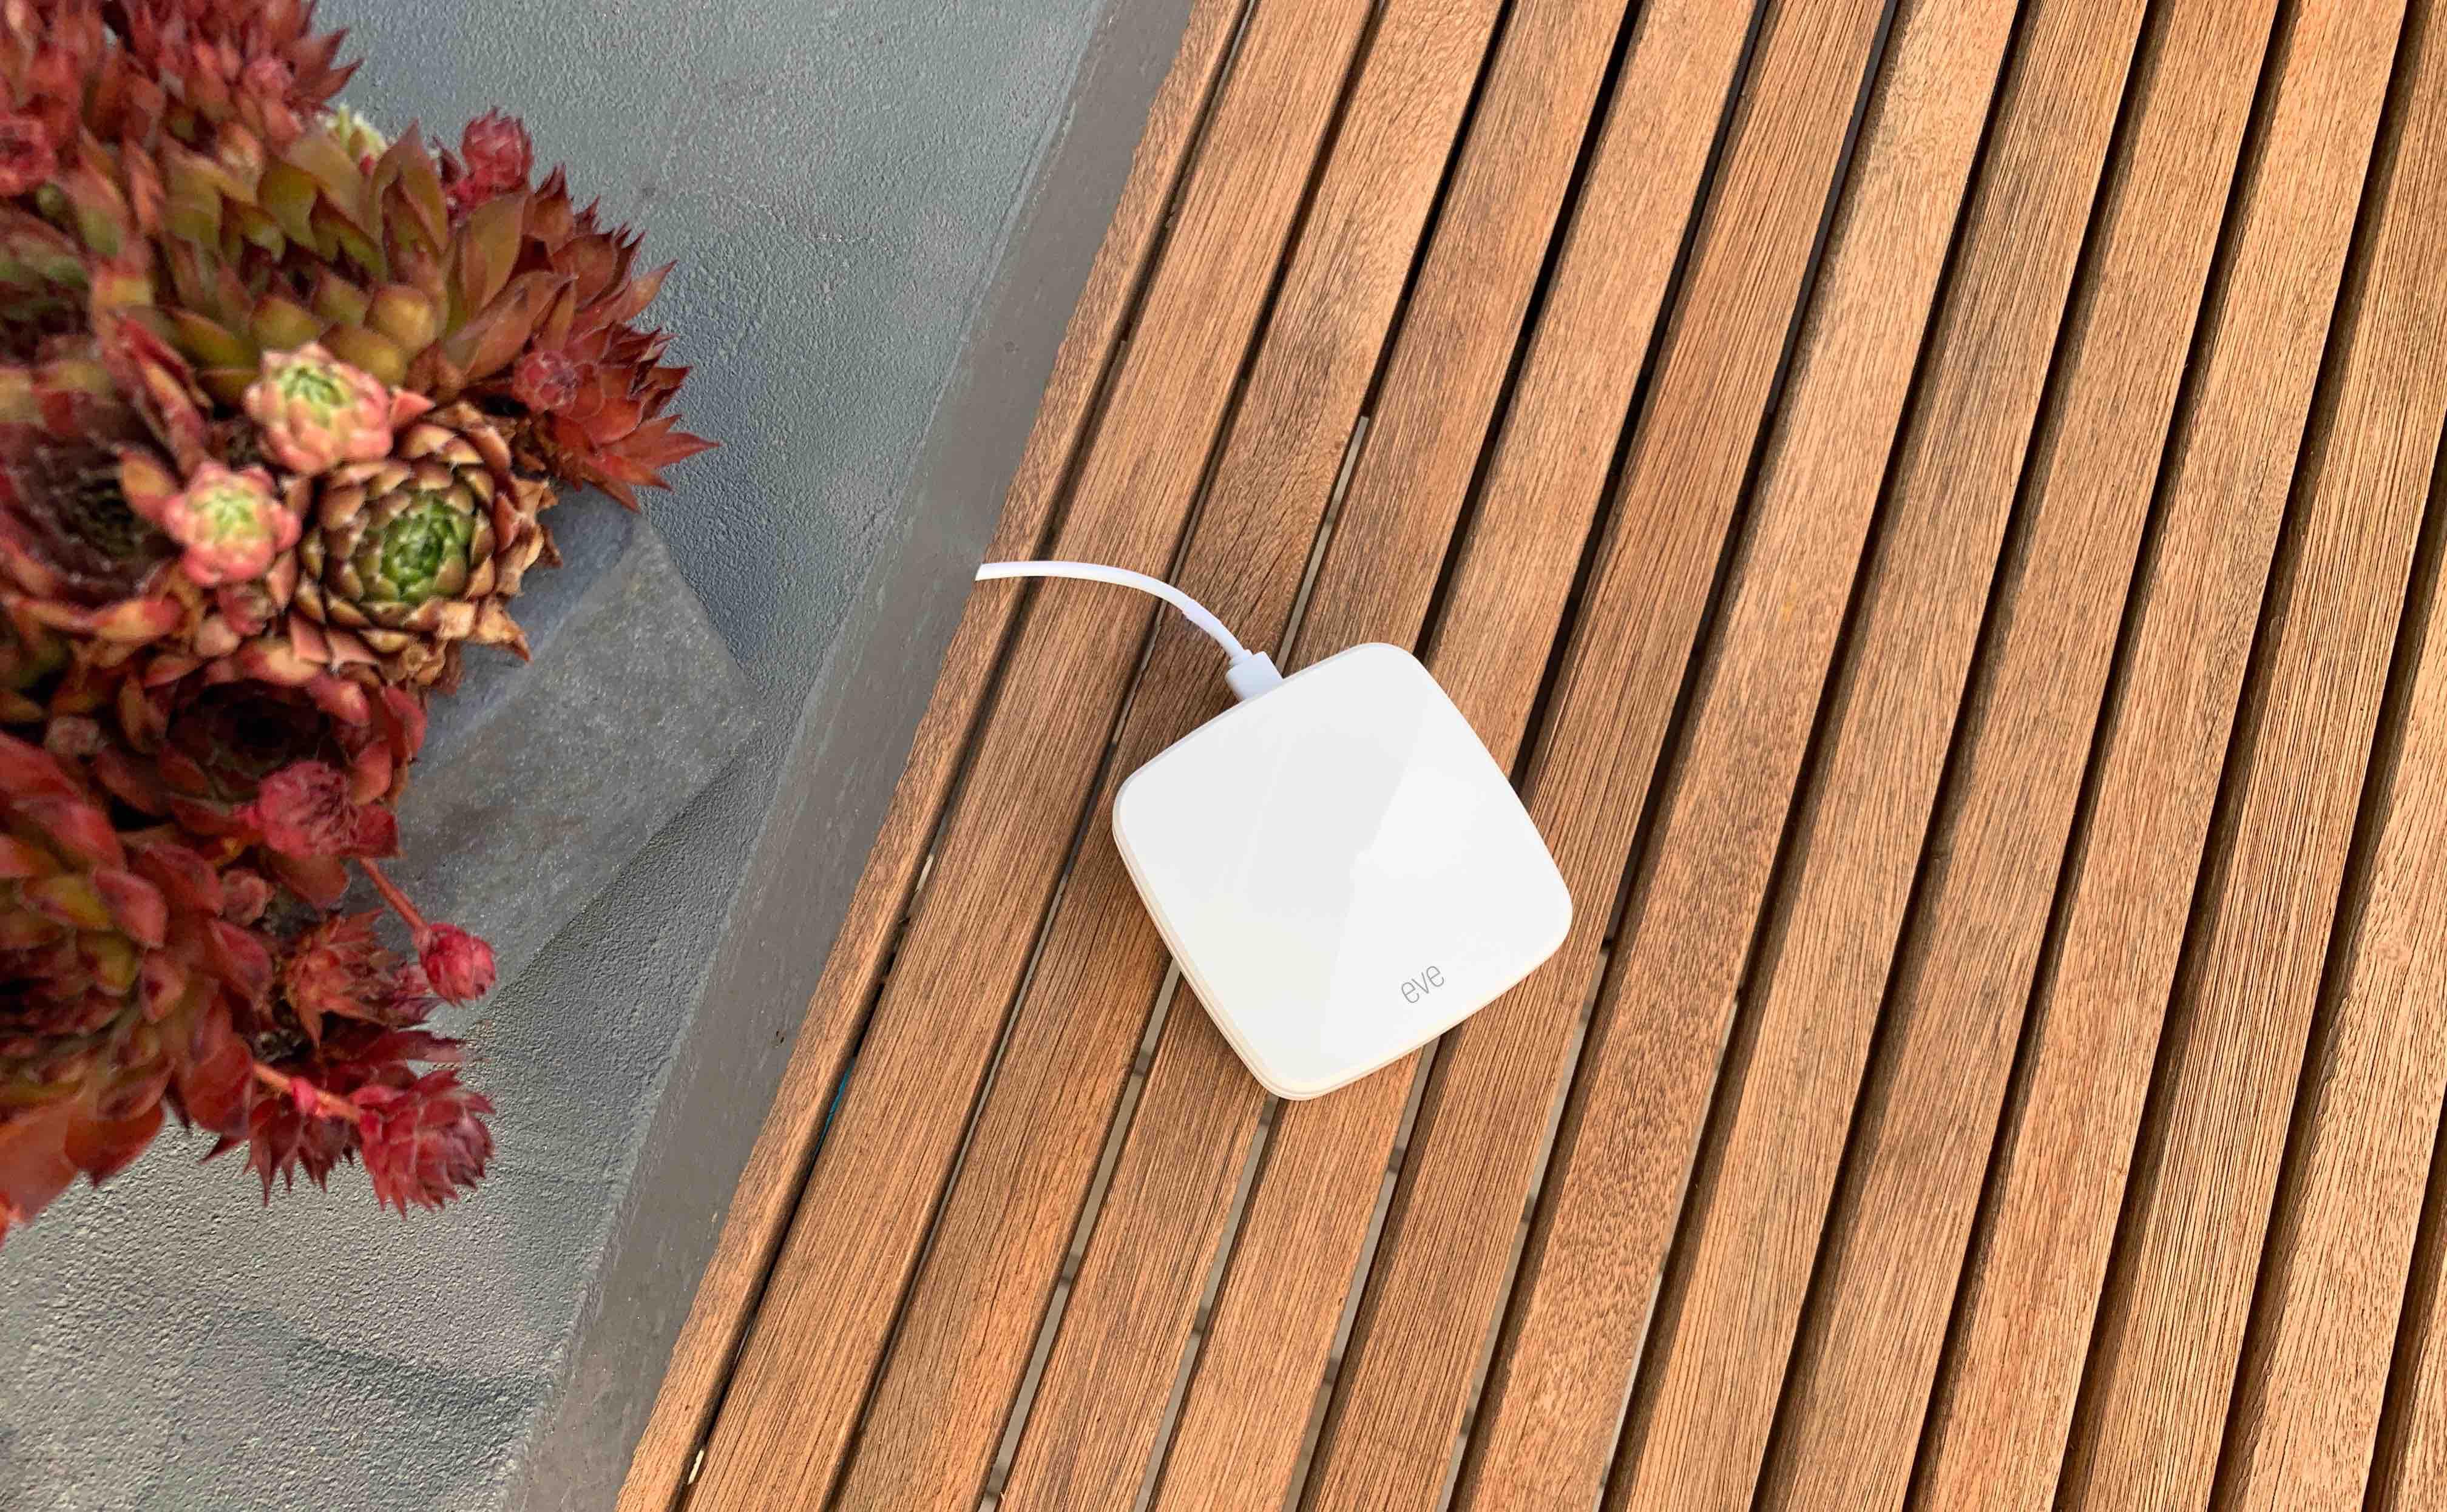 Eve_Extend_Bluetooth_Repeater_HomeKit_WiFi_WLAN_Gateway_Review2 Eve Extend von Eve - Bluetoothreichweite unter Apple HomeKit ins WiFi verlagern